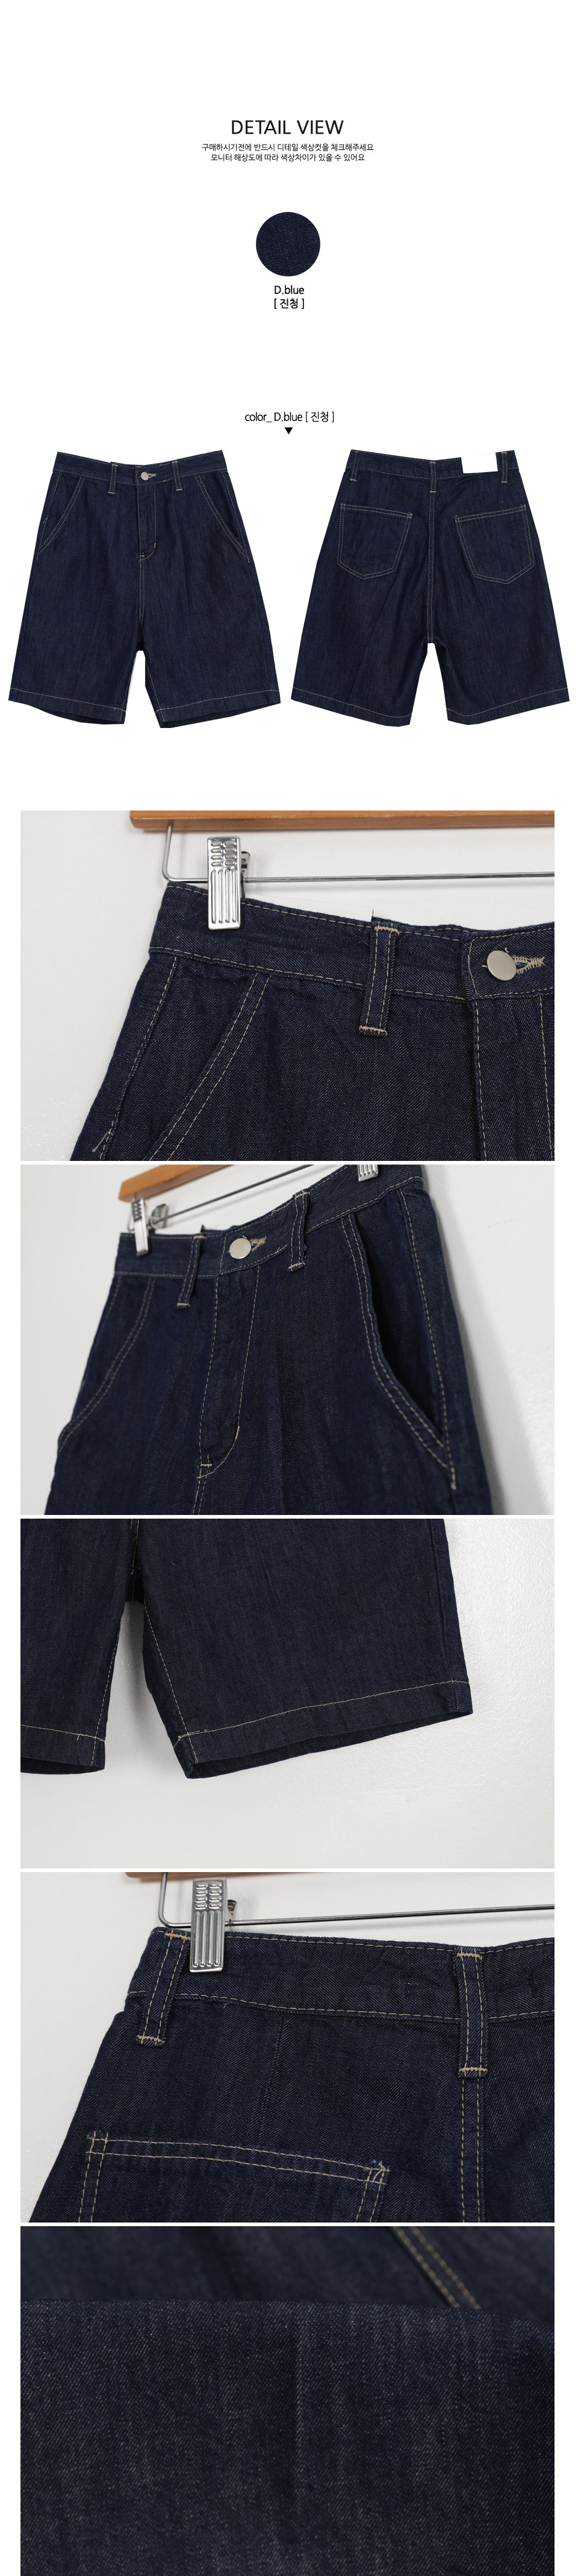 Mood Raw 4.5 pants